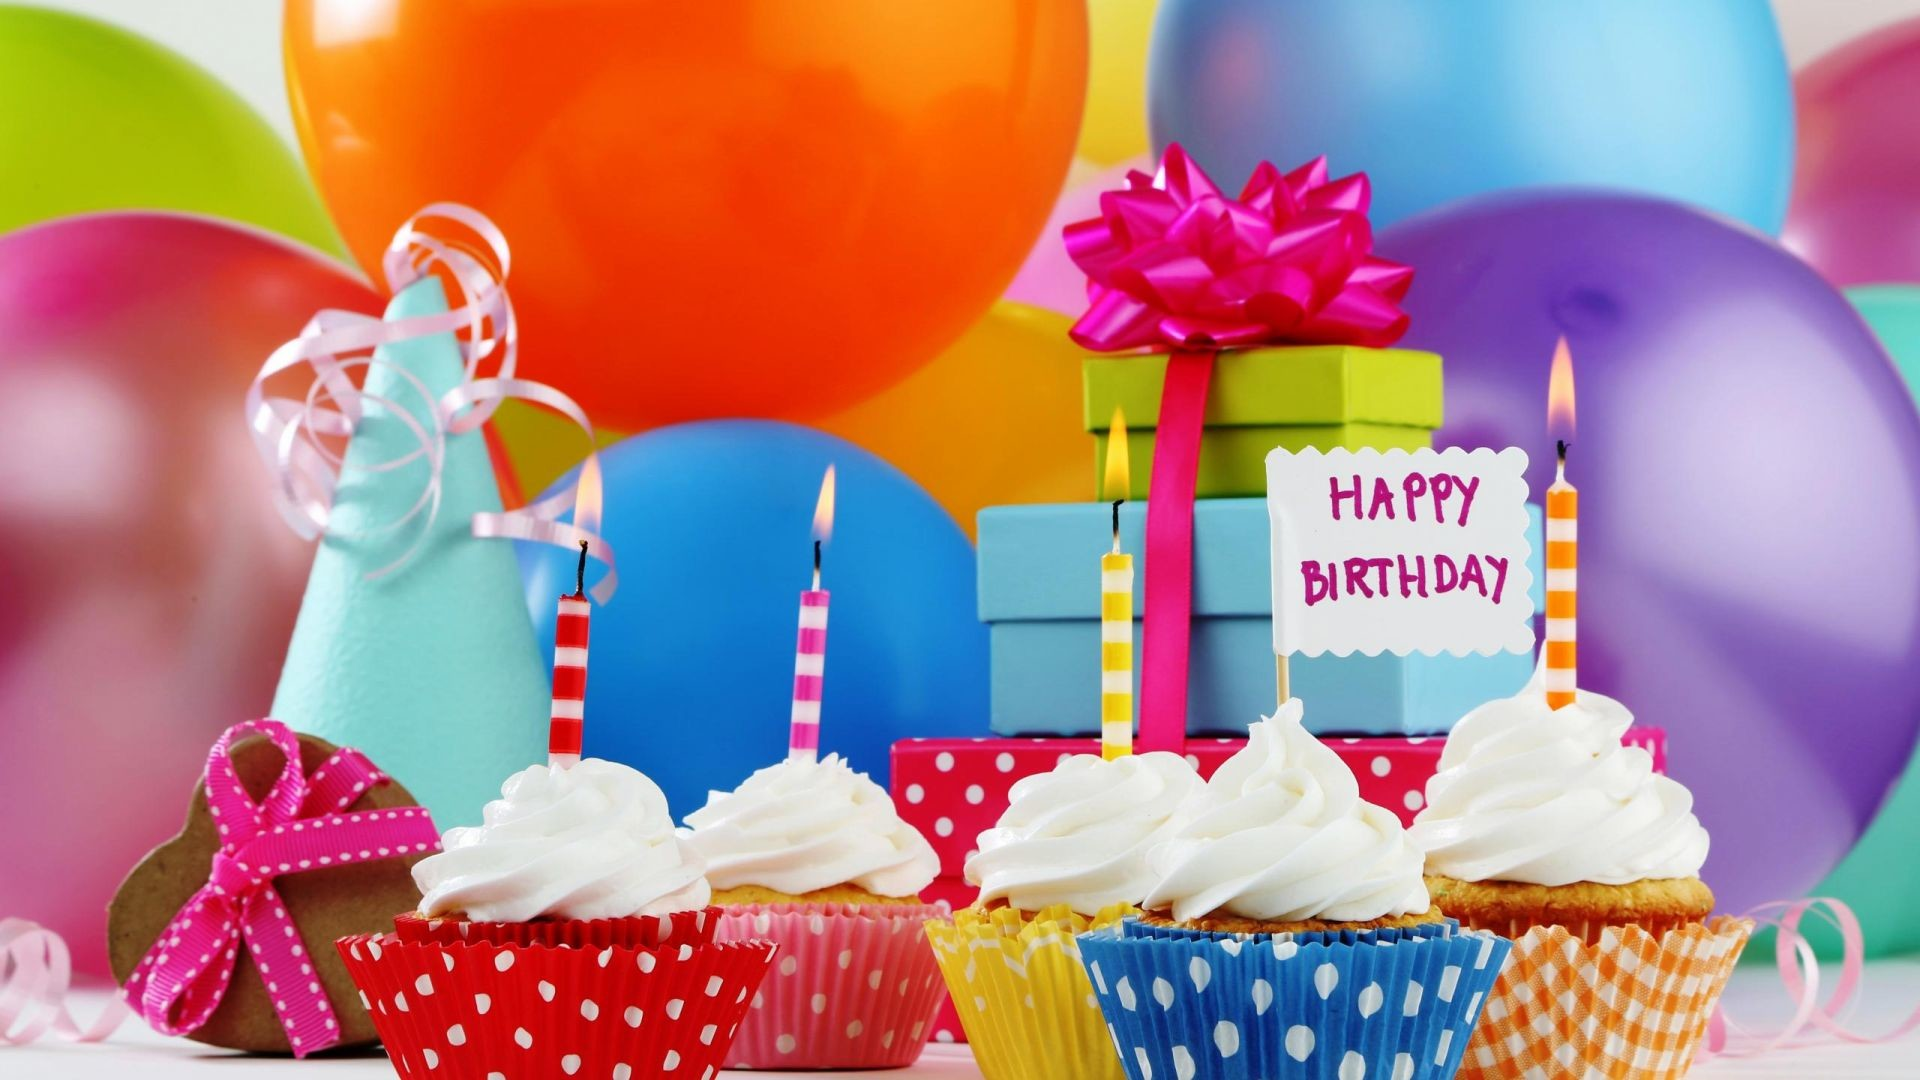 … Happy Birthday With Gift Of Buke Hd Wallpaper HD Birthday .